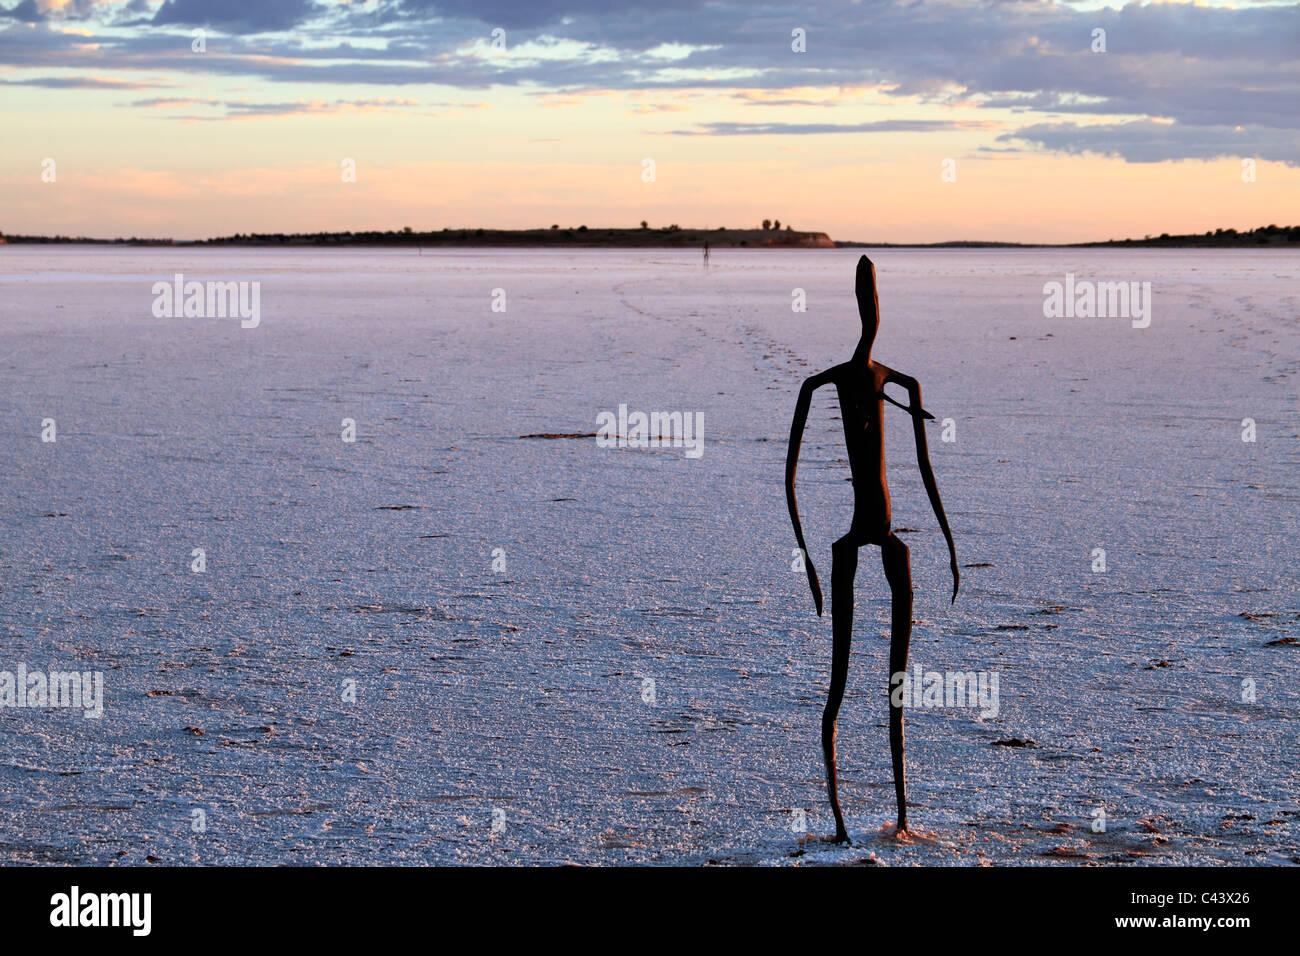 Sculpture by Antony Gormley, Inside Australia exhibition, on Lake Ballard, Western Australia - Stock Image